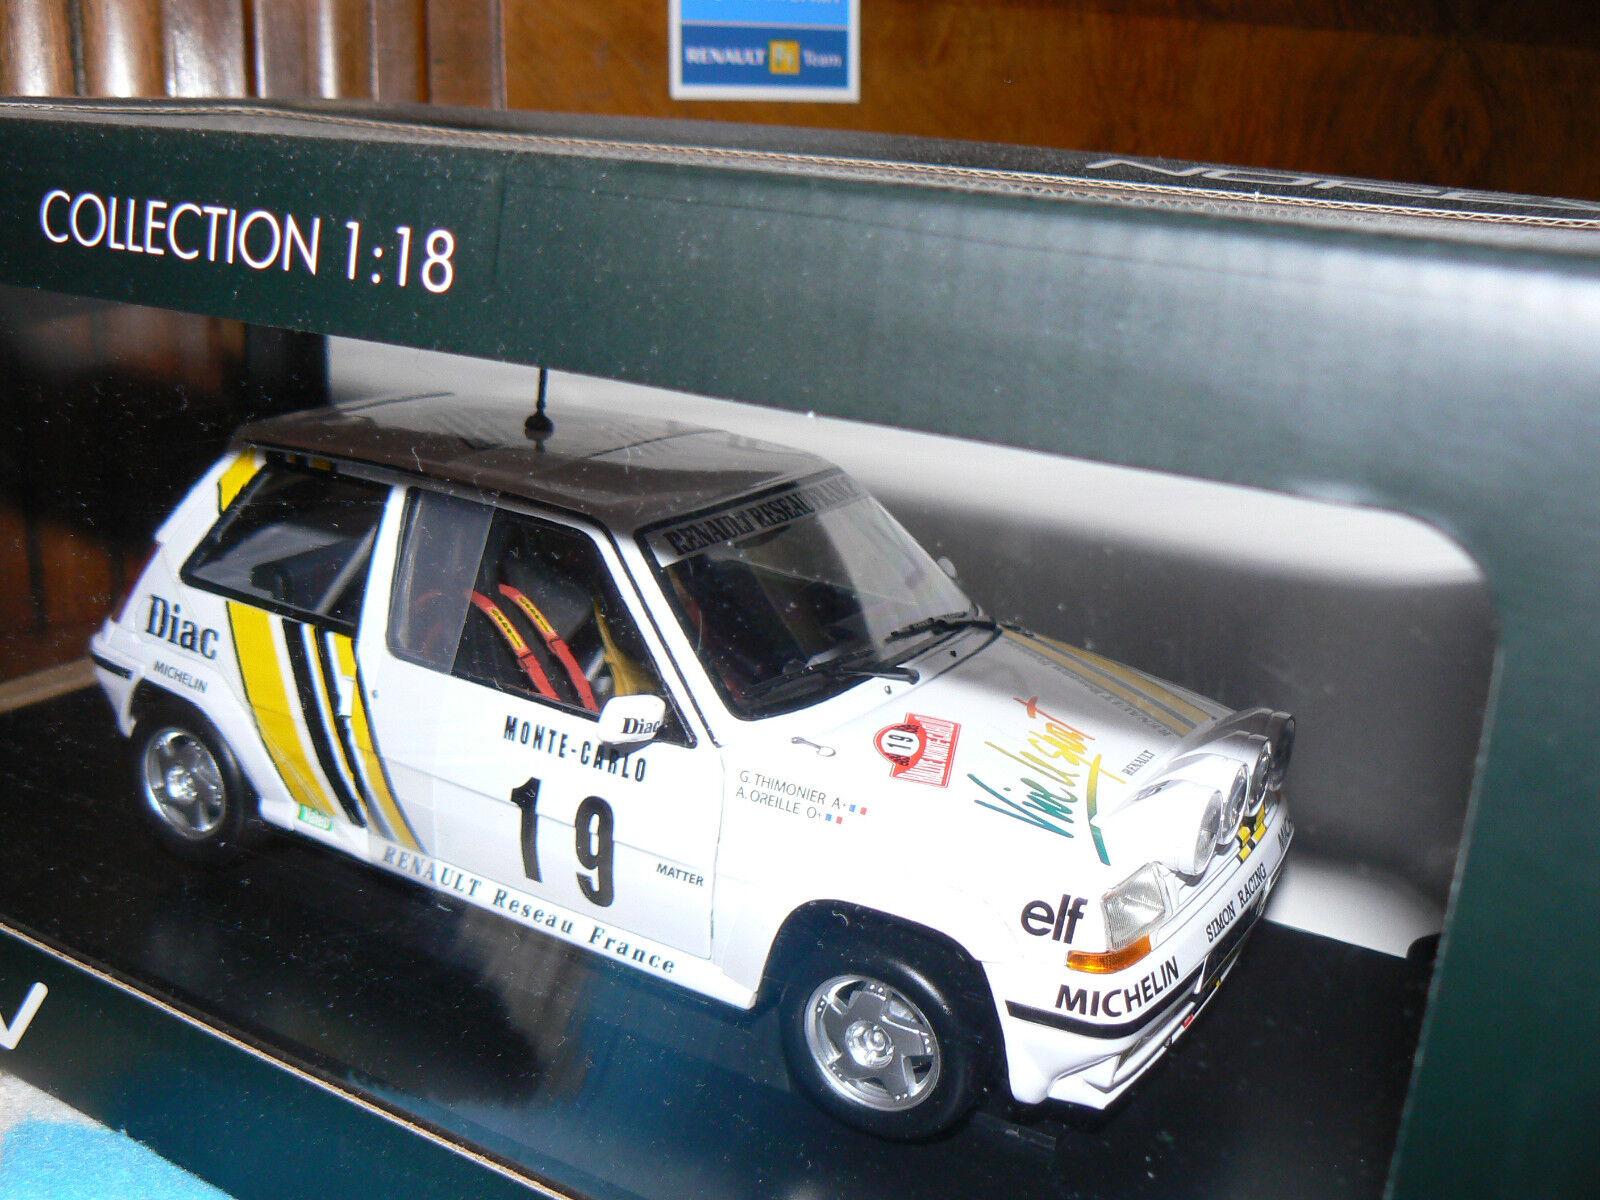 Renault 5 gt turbo super 5 rallye monte carlo nuit  A. oreille 1 18 1 18 norev